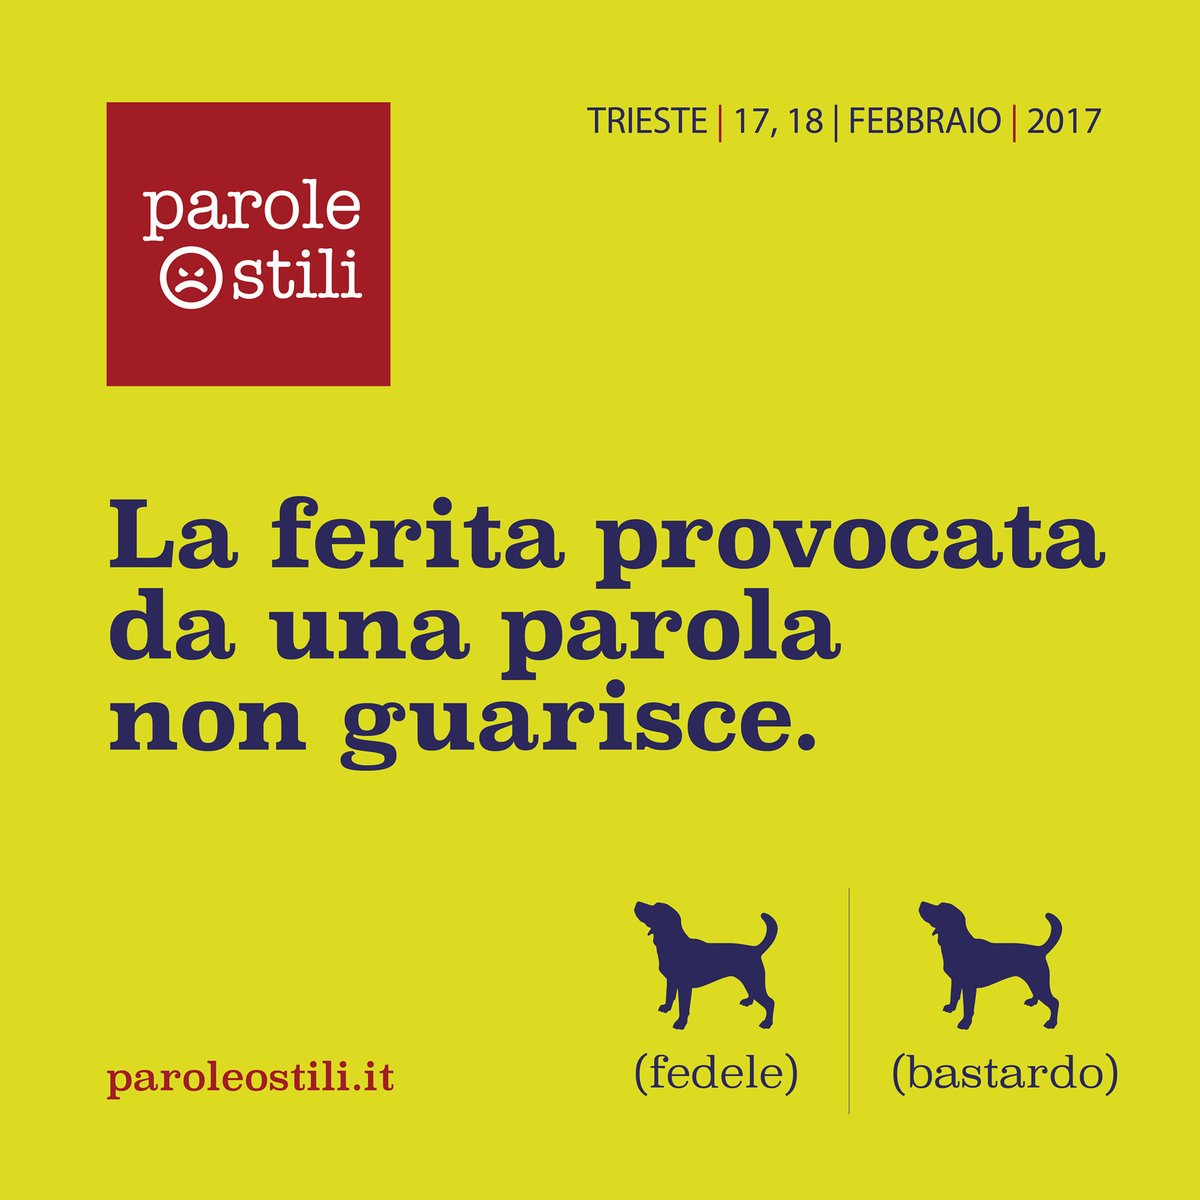 #ParoleOstili